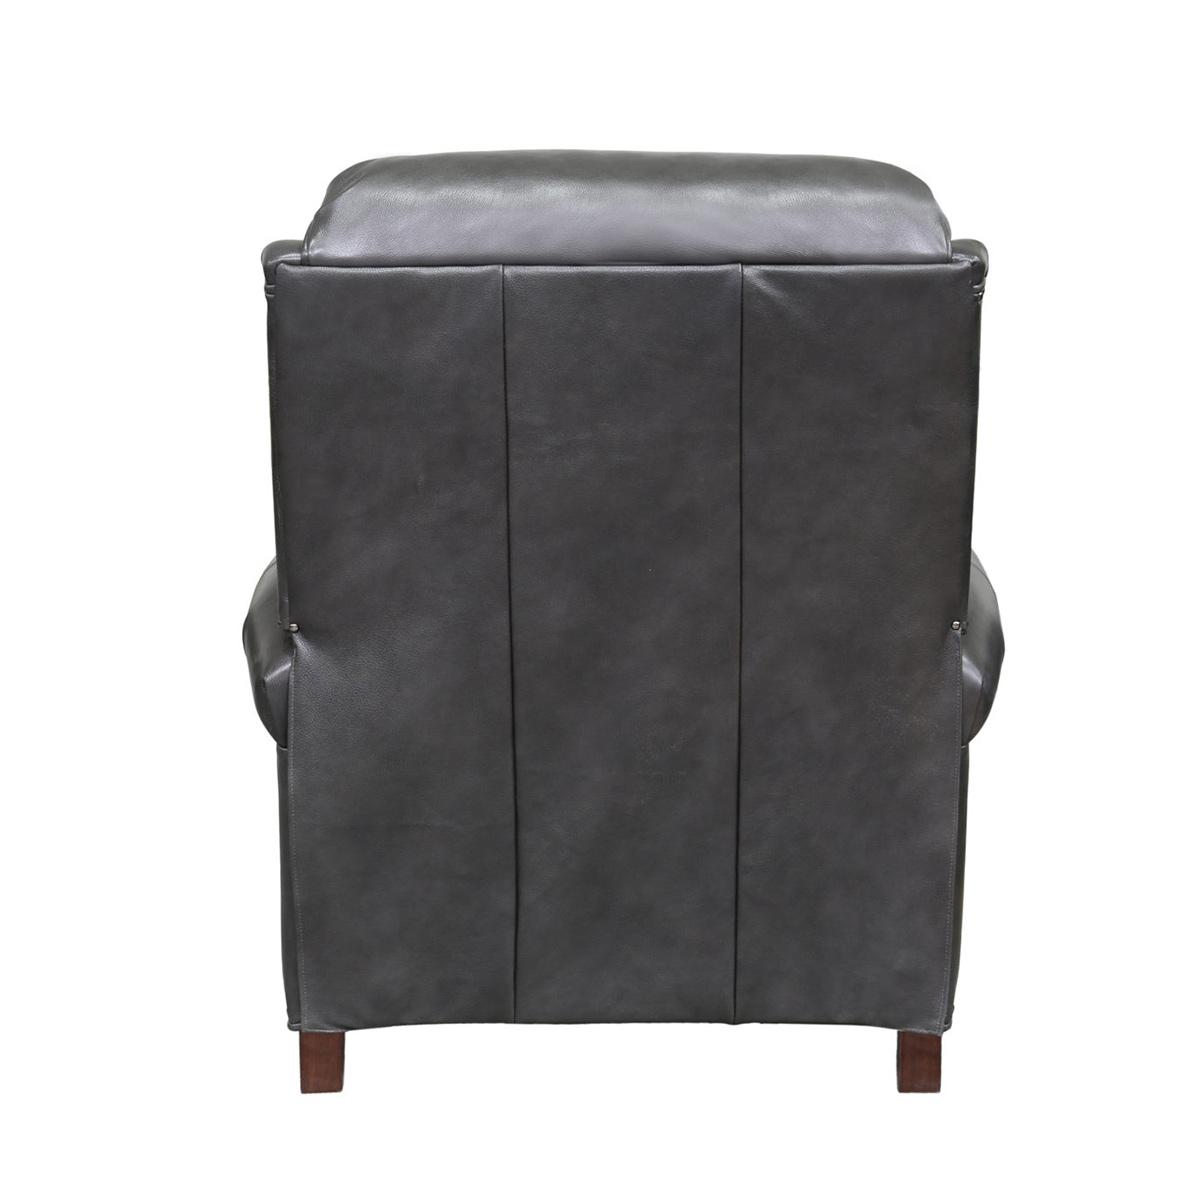 Barcalounger Avery Recliner Chair - Wrenn Gray/all leather